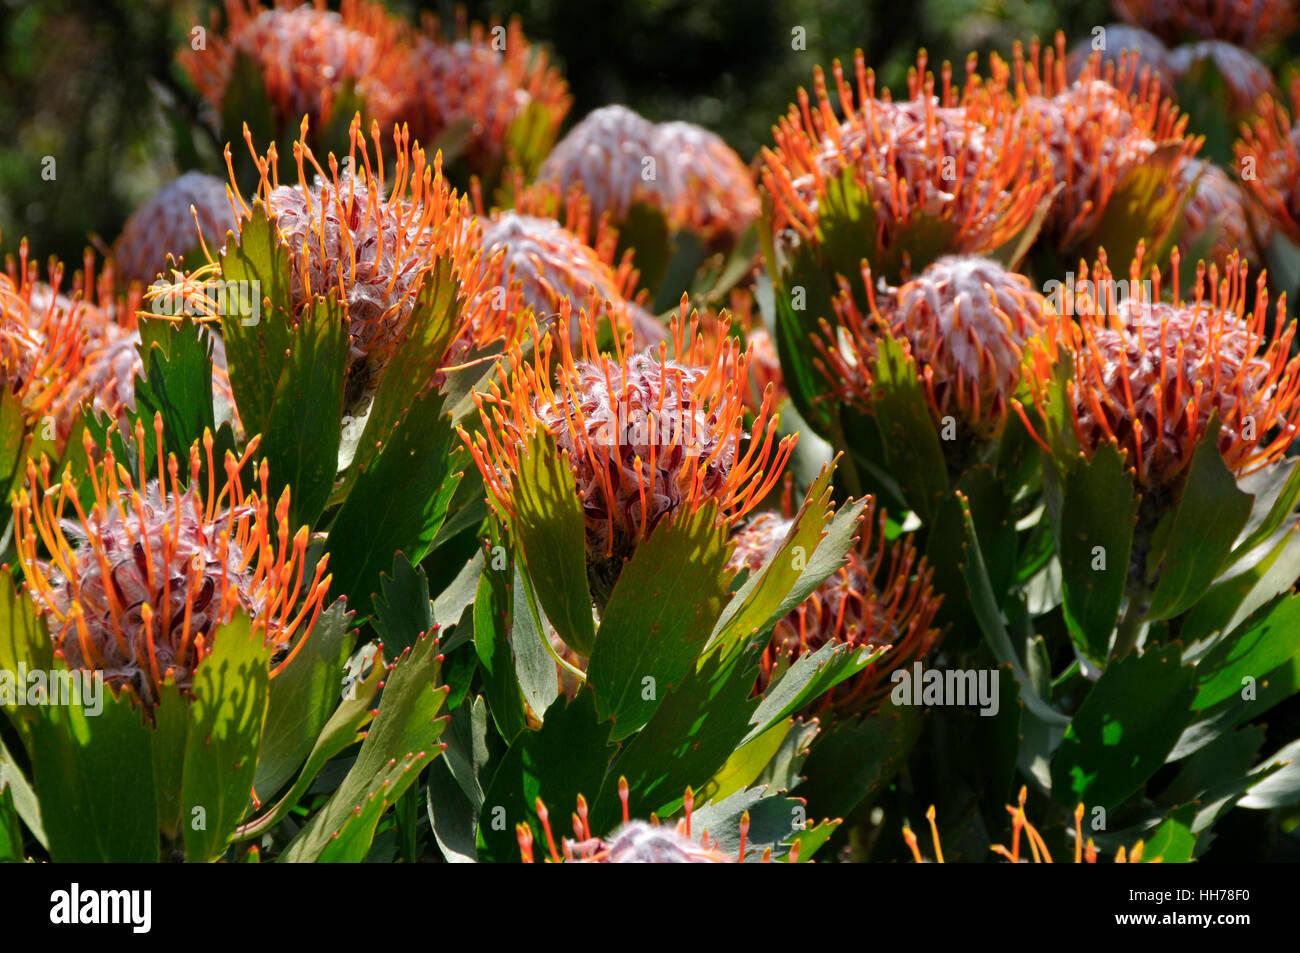 Leucospermum glabrum flower stock photos leucospermum glabrum the beautiful flowers of a pincushion stock image izmirmasajfo